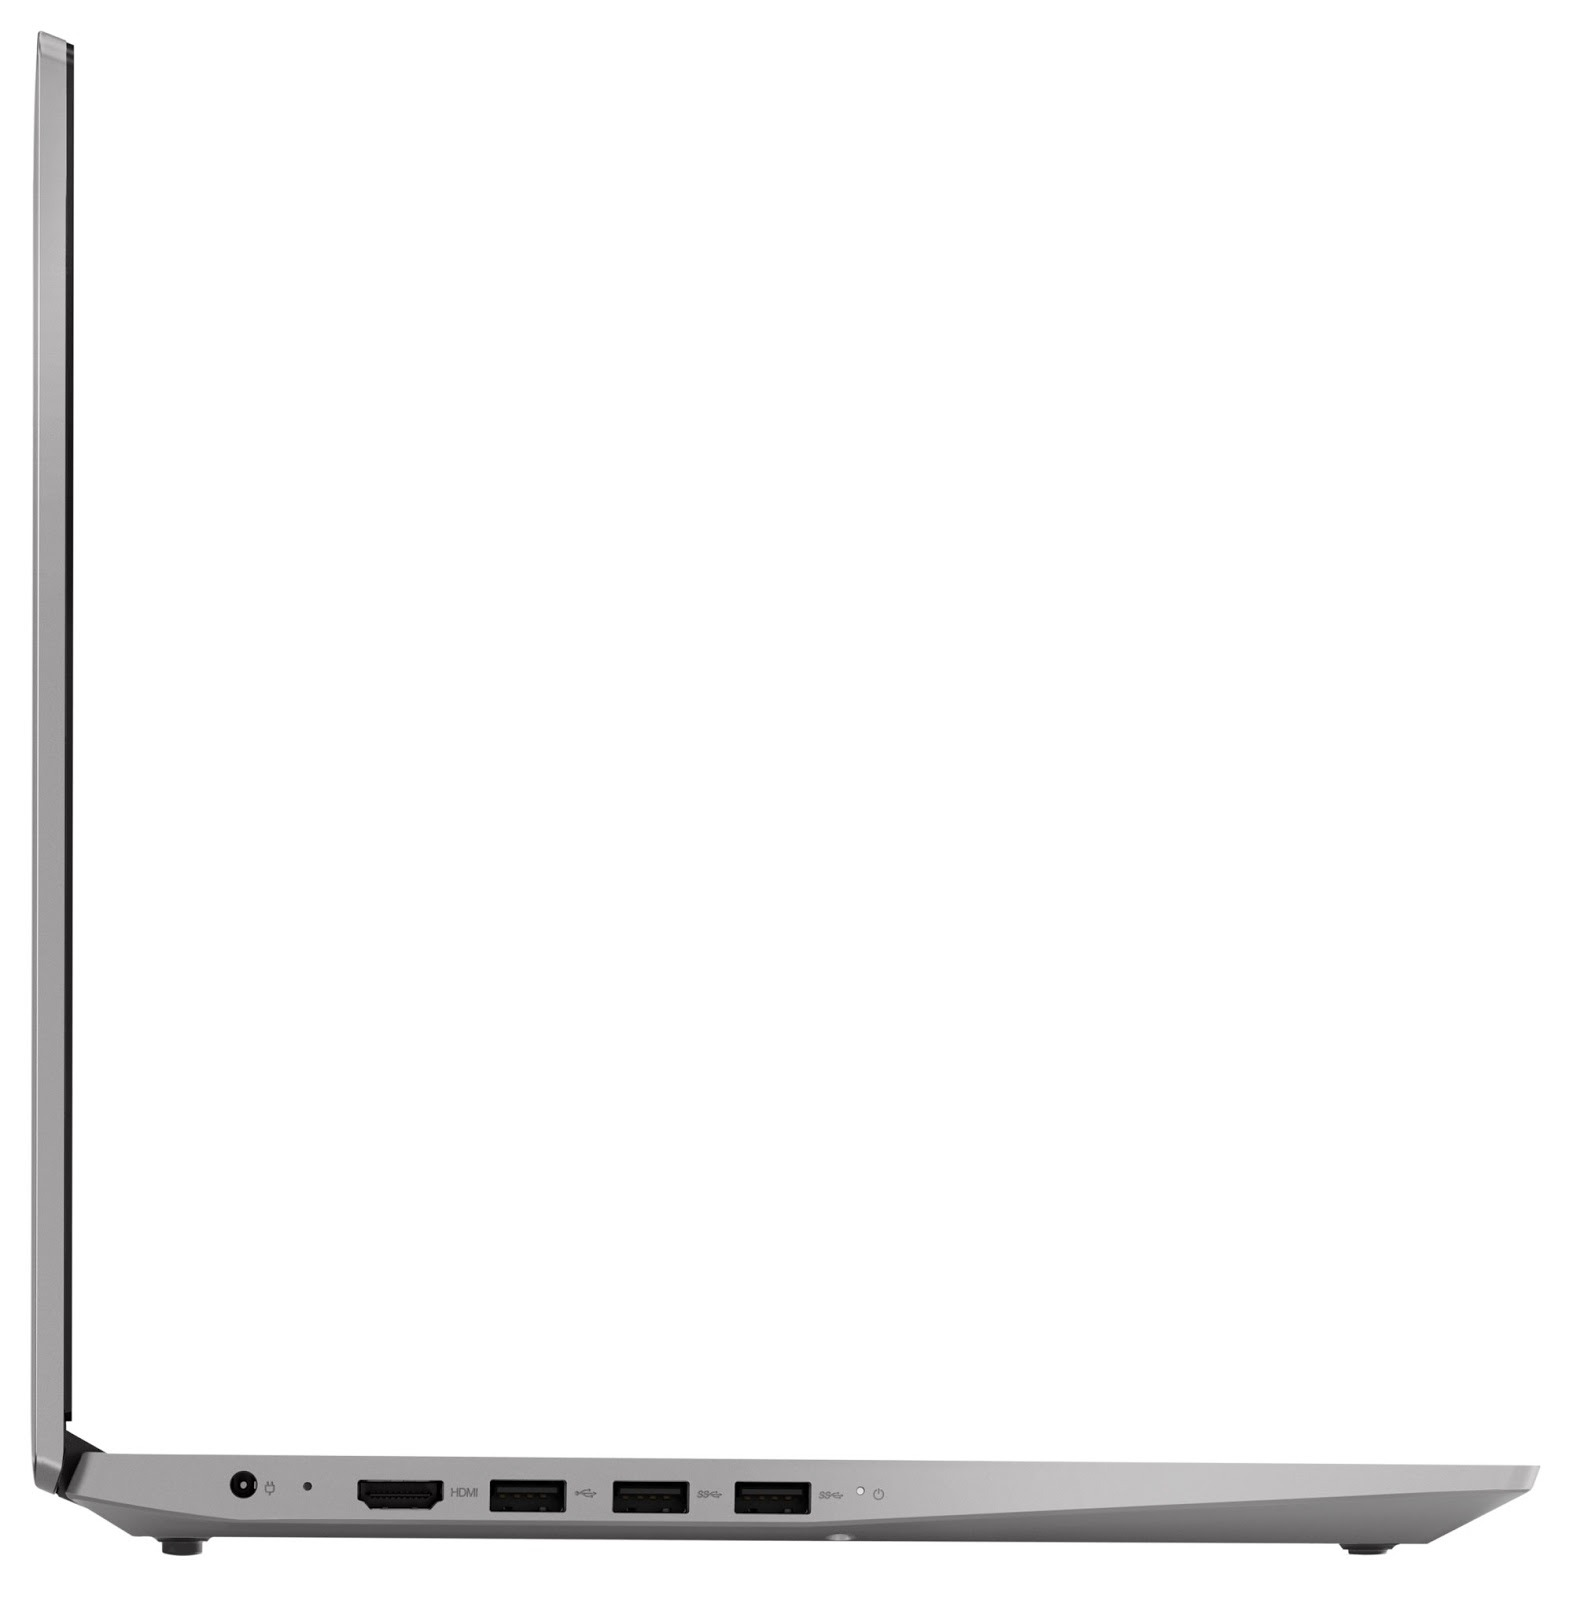 Фото 5. Ноутбук Lenovo ideapad S145-15IGM Grey (81MX001JRE)